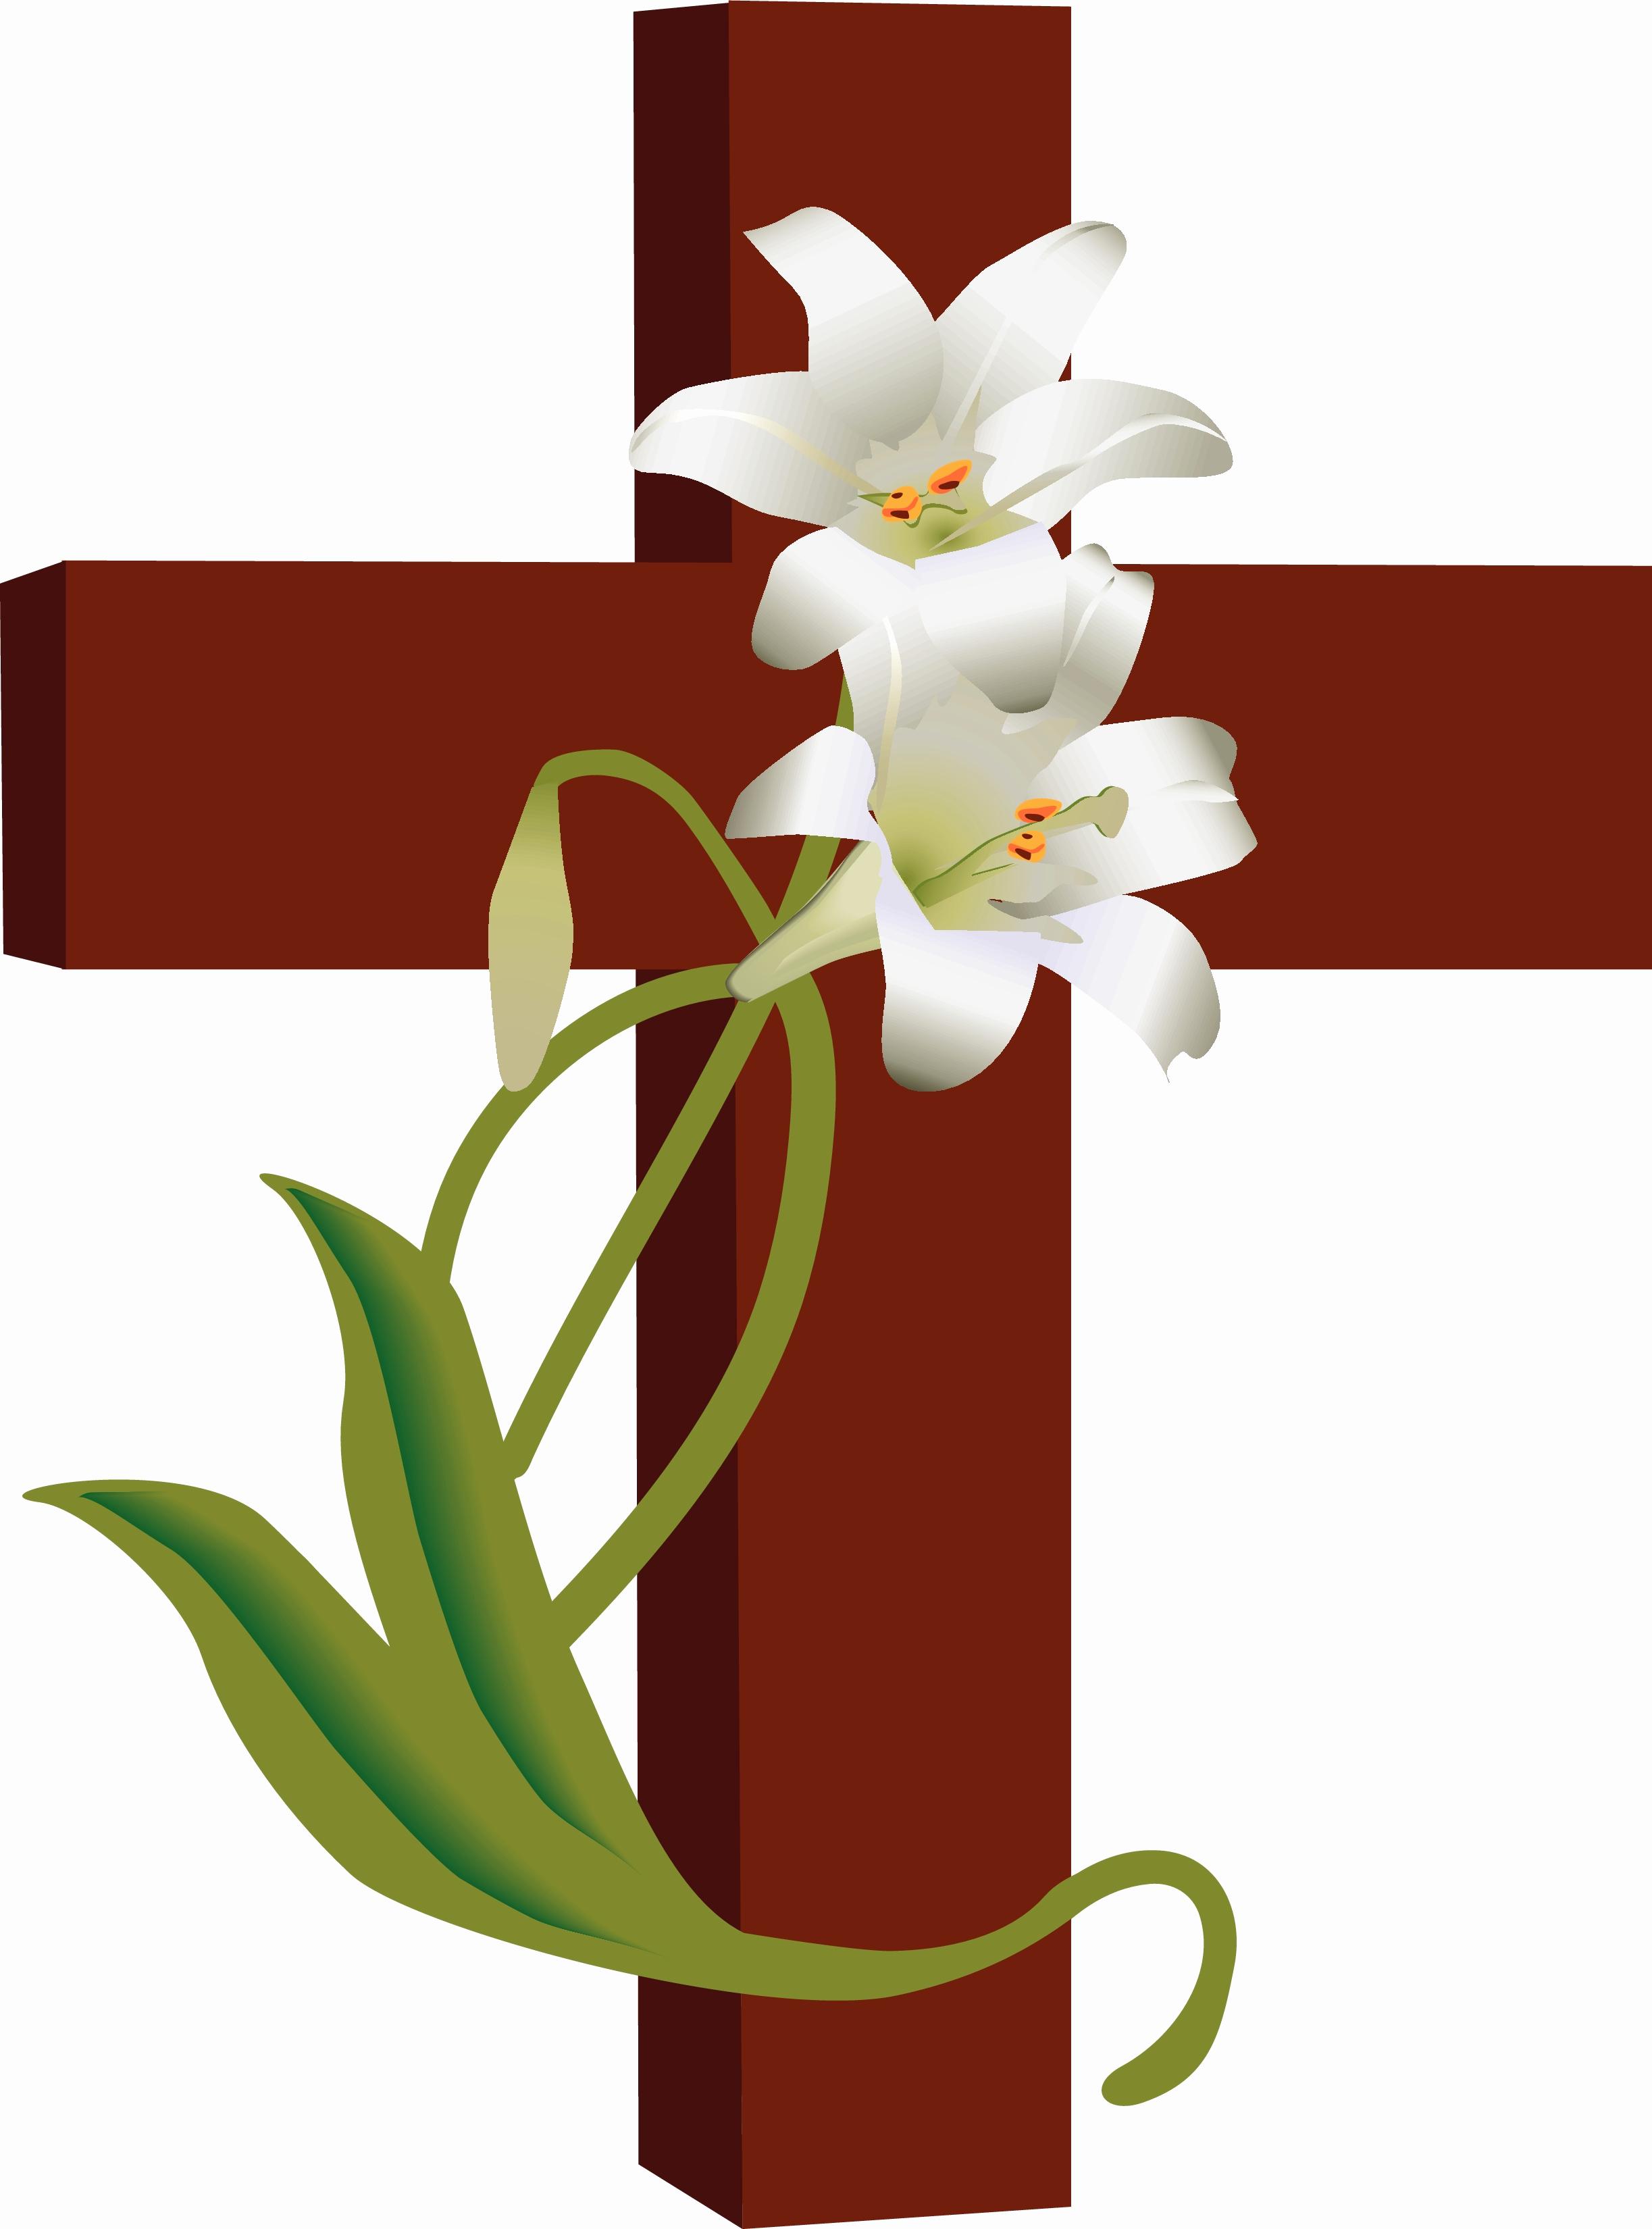 Best Free Clip Art Elegant Cross Clipart Ideas On Easter Images 6 2 Clipartix